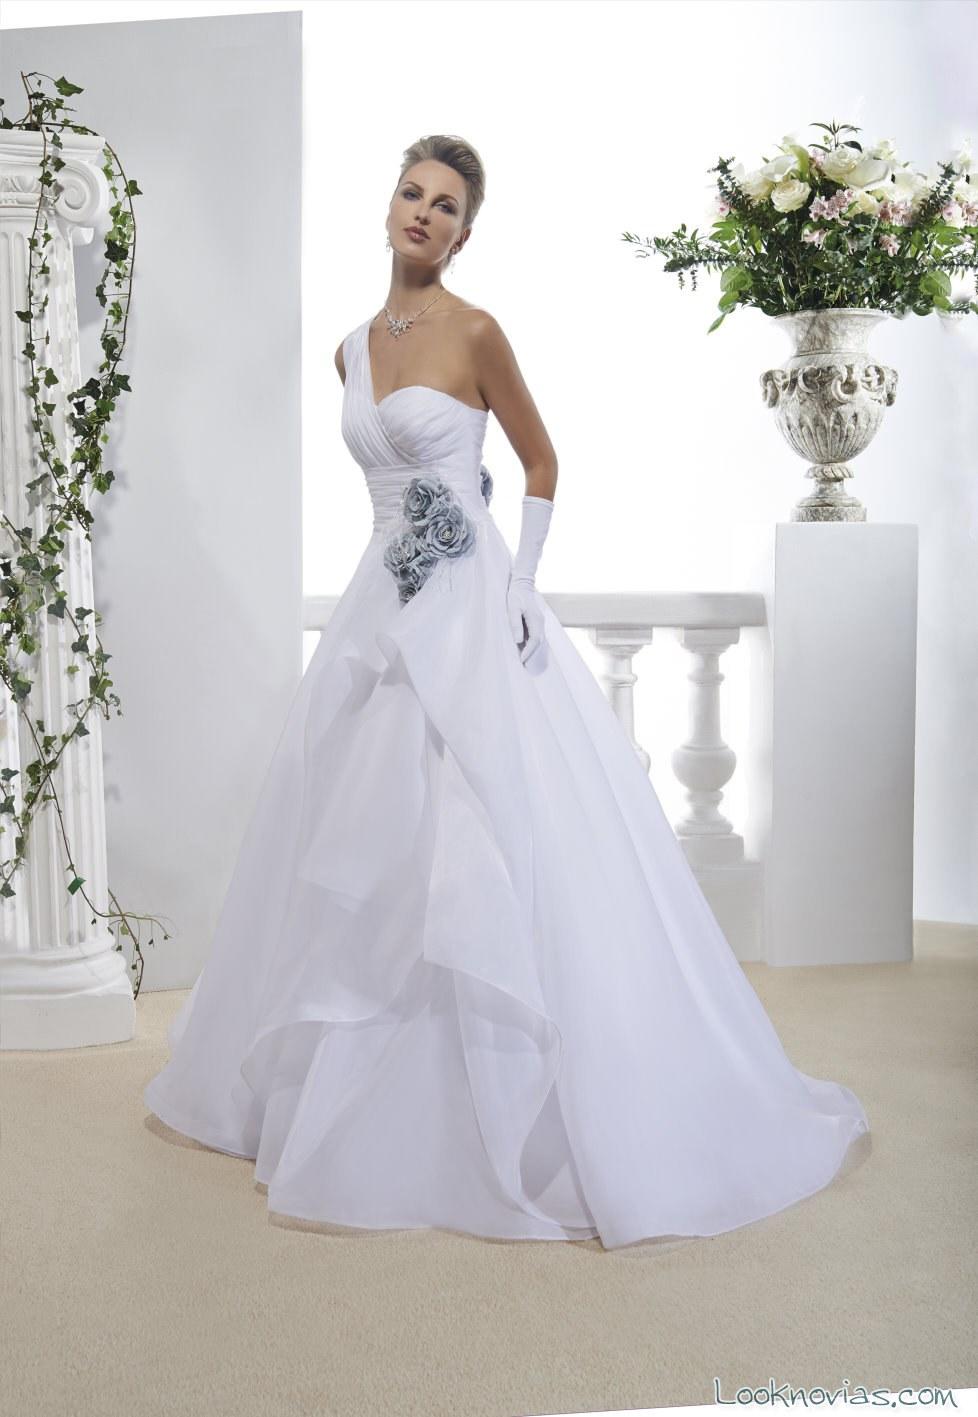 vestido de novia annie couture con bordados azules